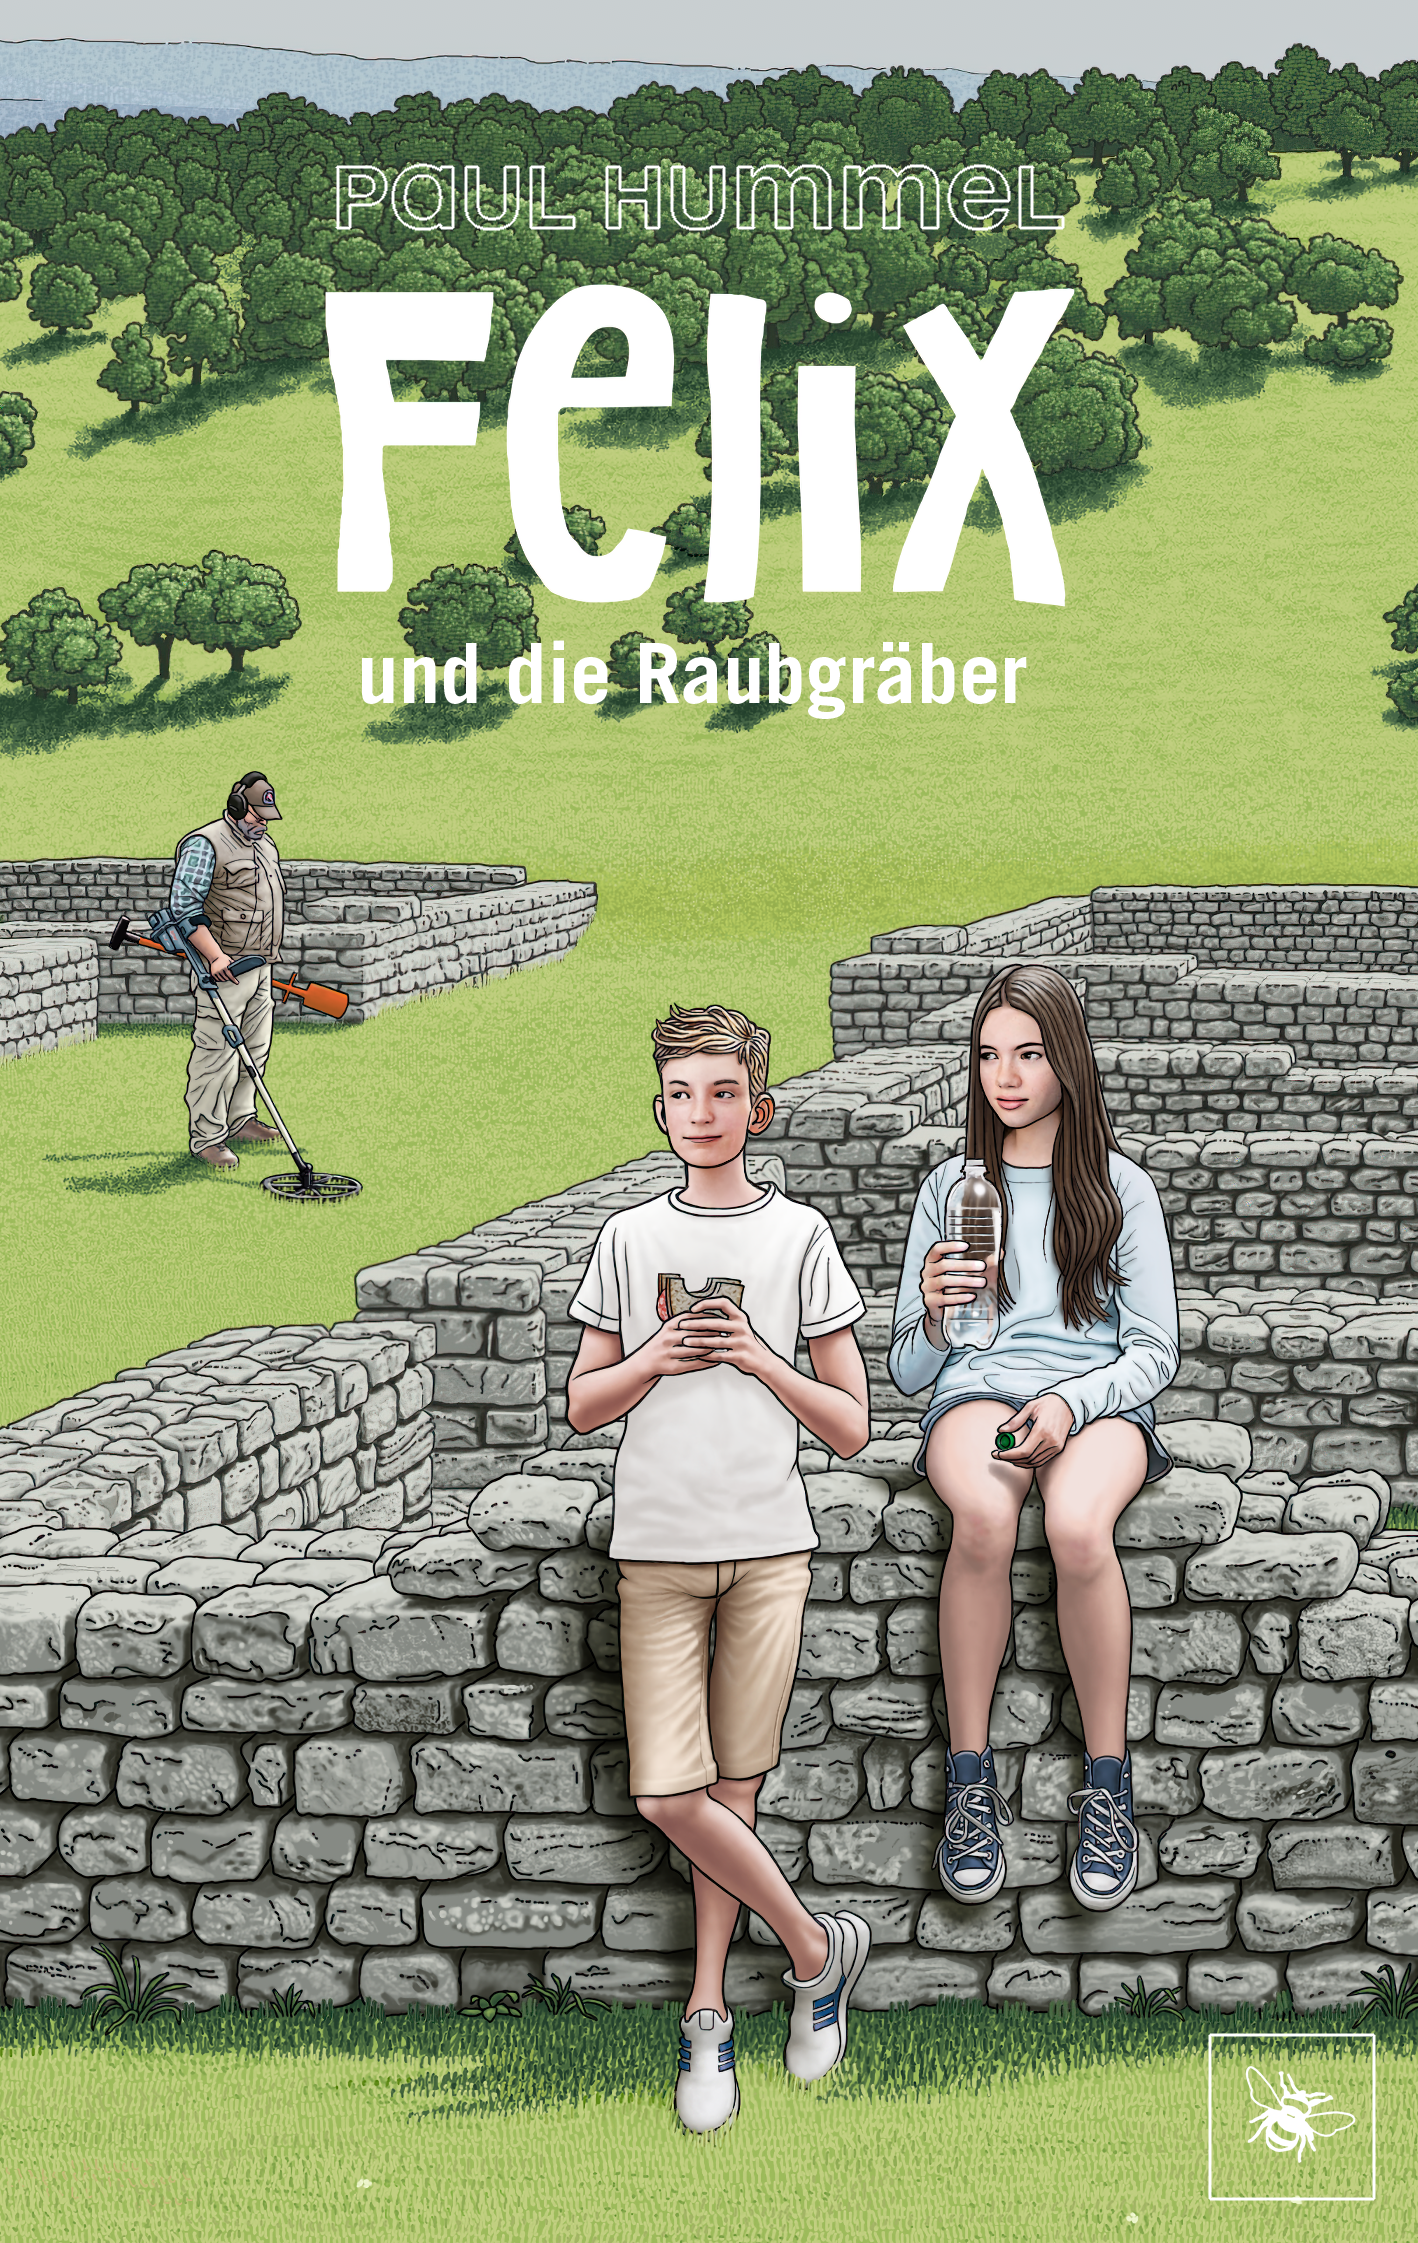 paul-hummel_felix-und-die-raubgraeber_cover